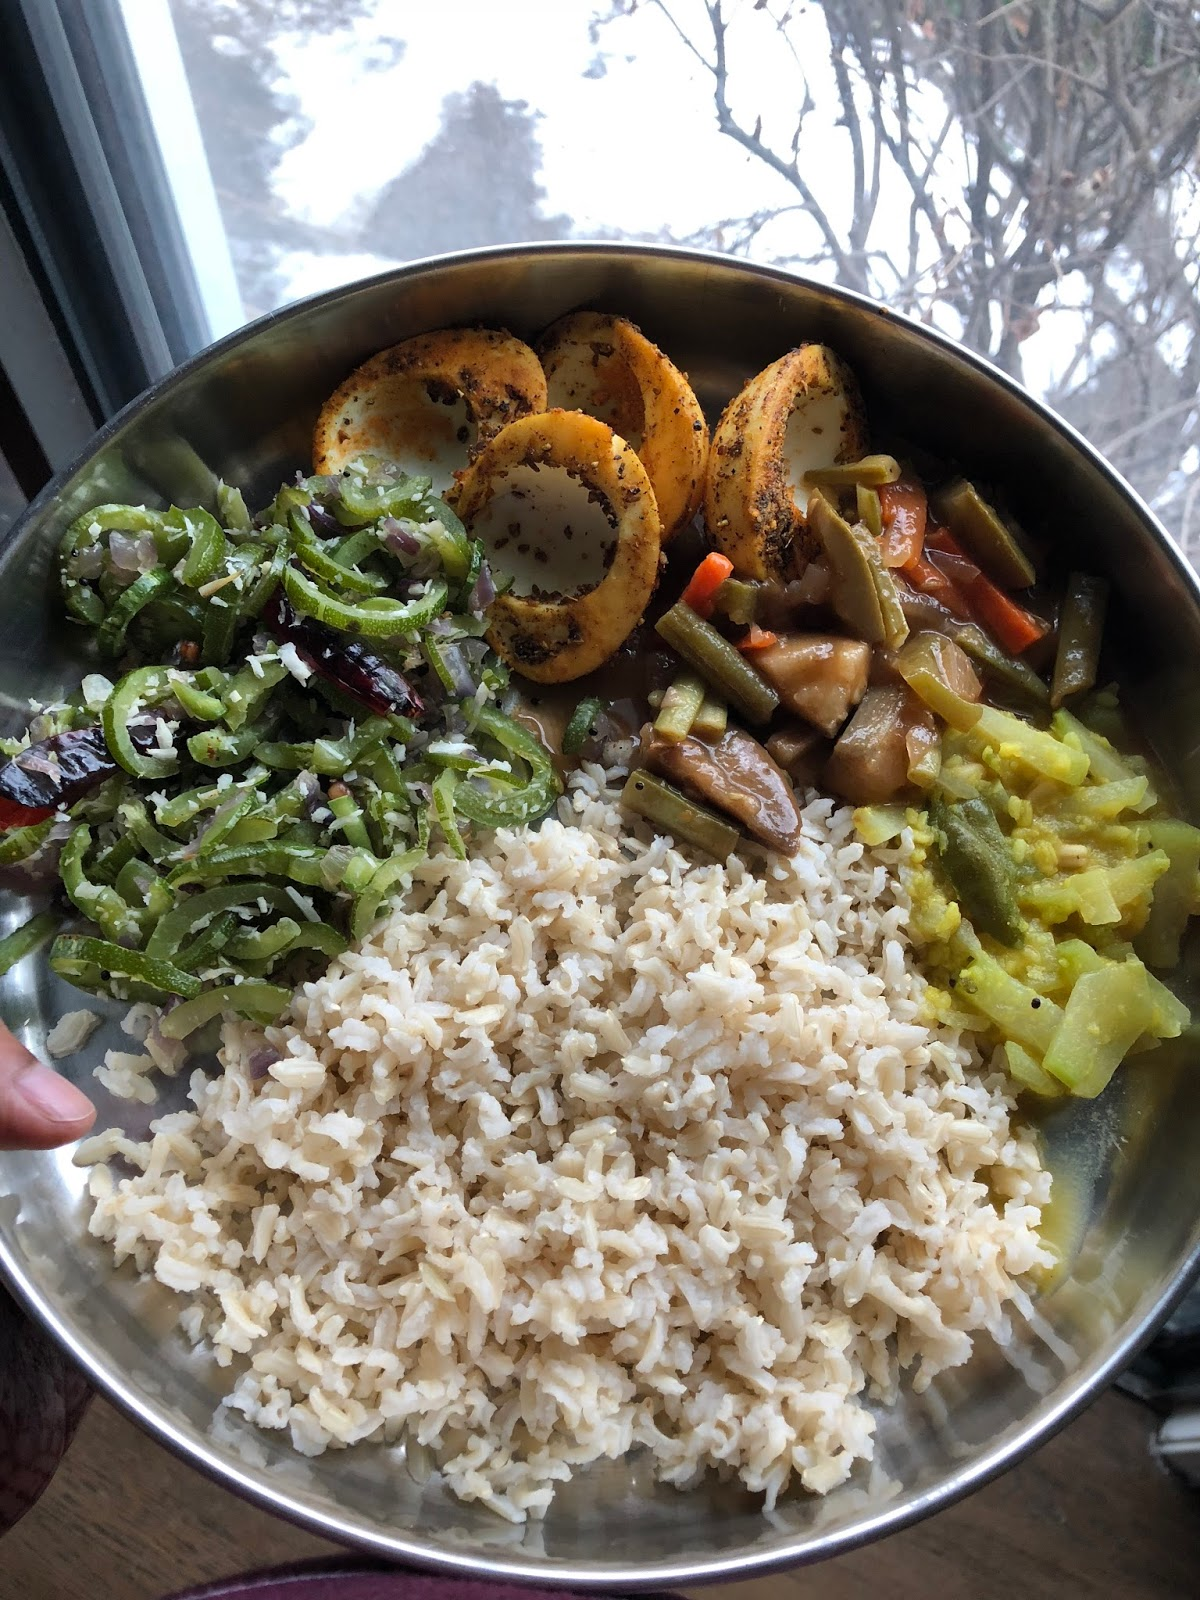 Gestational Diabetes Diet Indian : gestational, diabetes, indian, Cooking, Journal...:, Gestational, Diabetes, Options, Indian, Vegetarian, (Eggatarian)